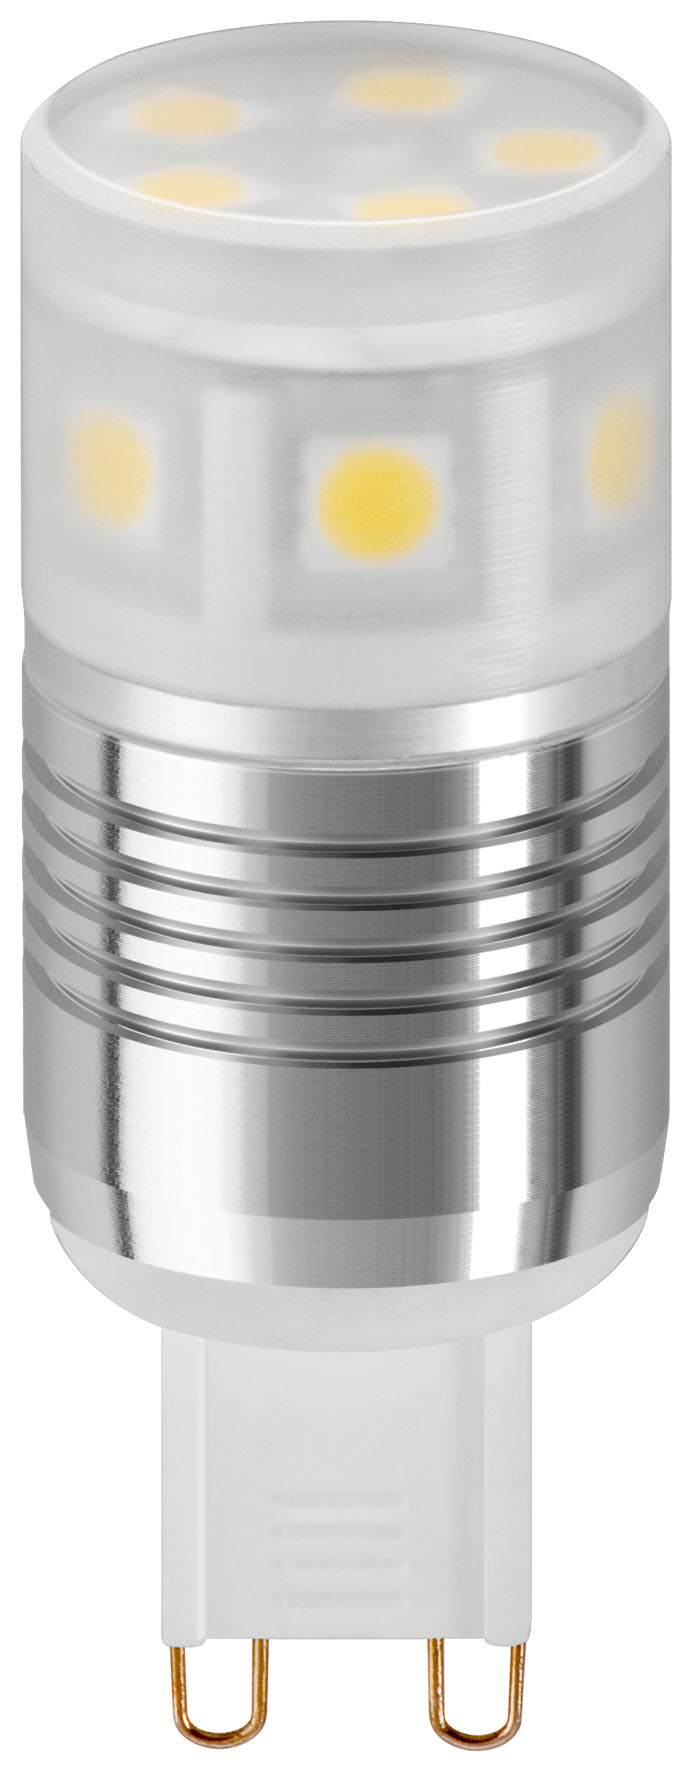 led lampe f r g9 lampensockel xled raumlicht g9 kalt wei 1 5w200 xlm. Black Bedroom Furniture Sets. Home Design Ideas